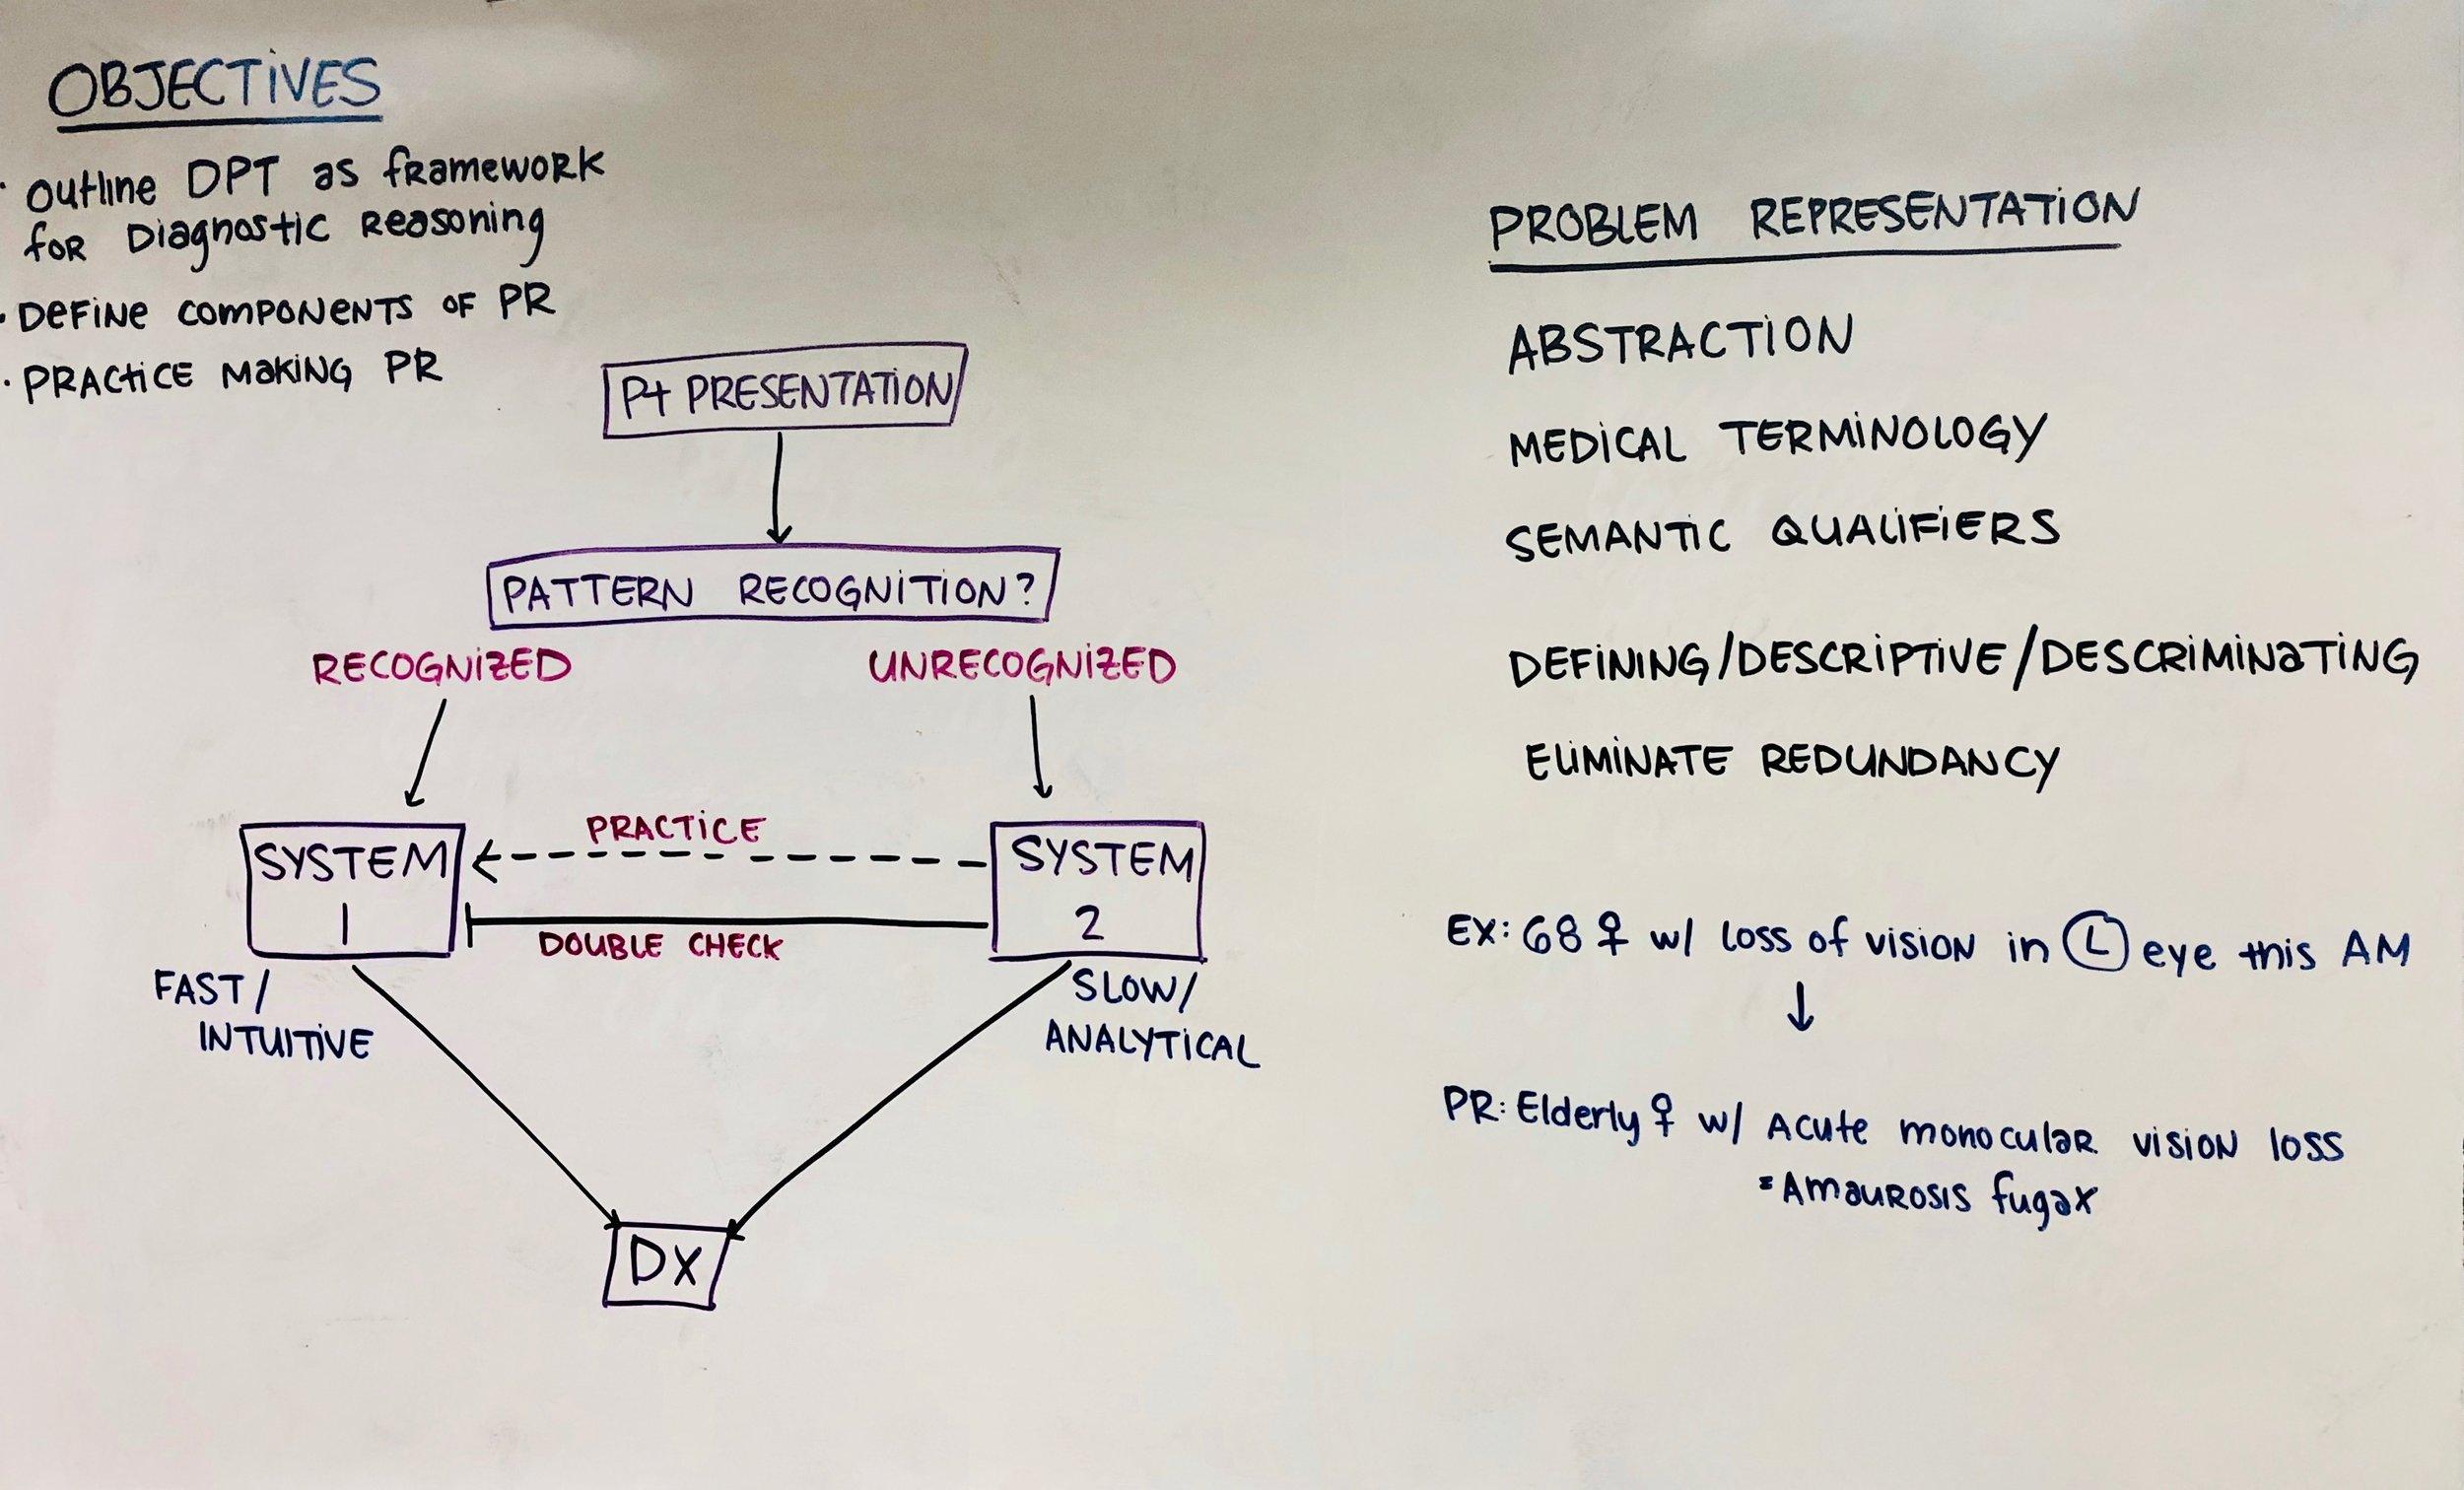 ClinicalReasoning (1).jpg